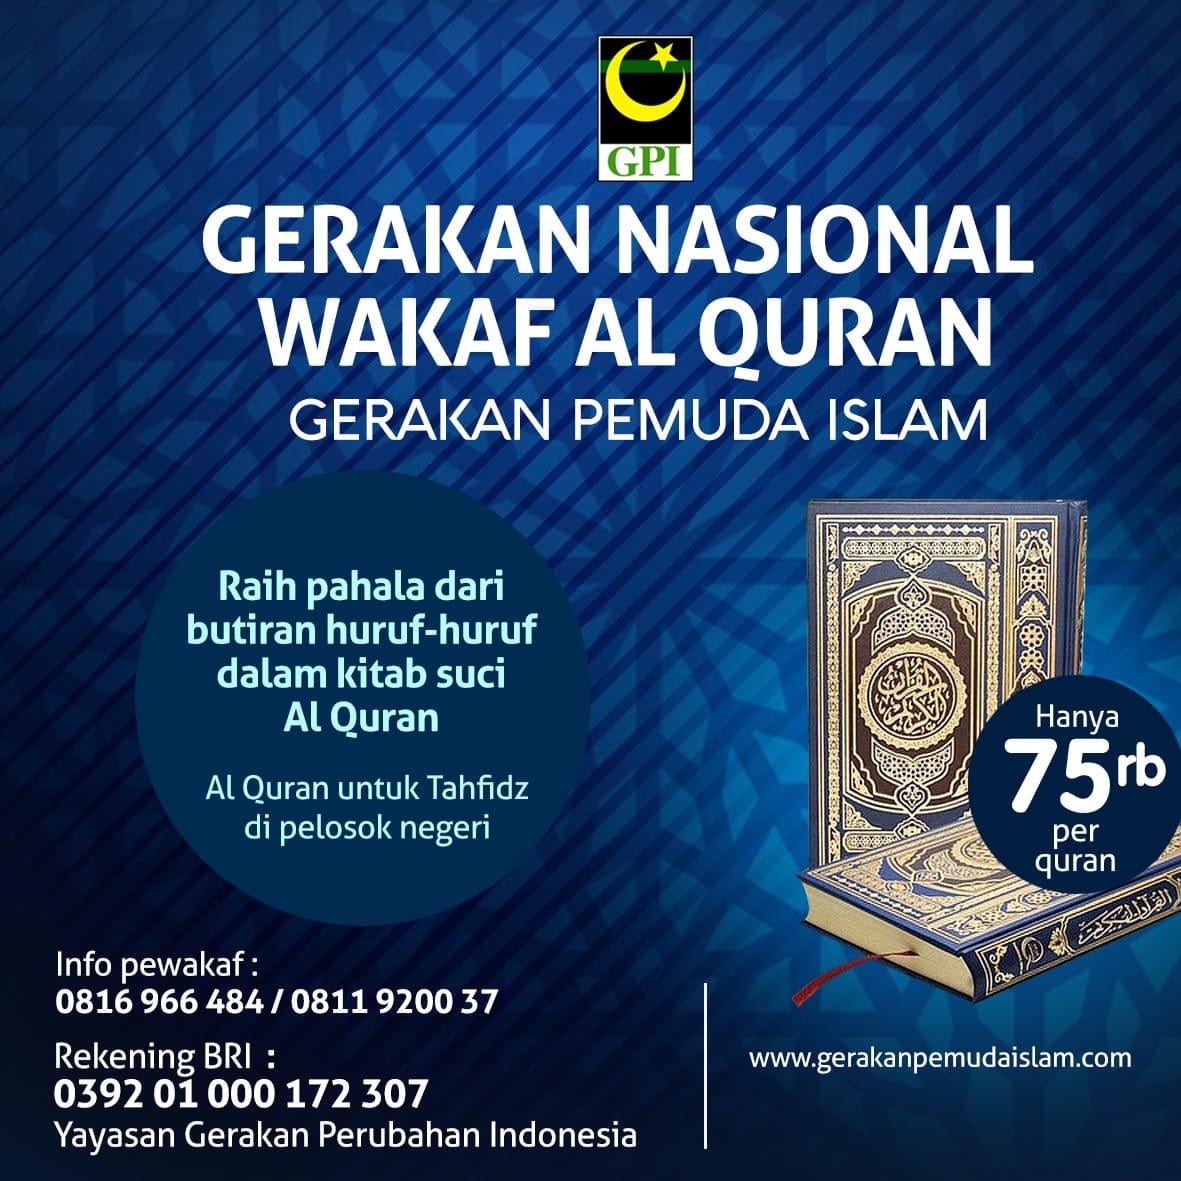 400 x 350 Program Nasional Gerakan Wakaf Al-Quran GPI